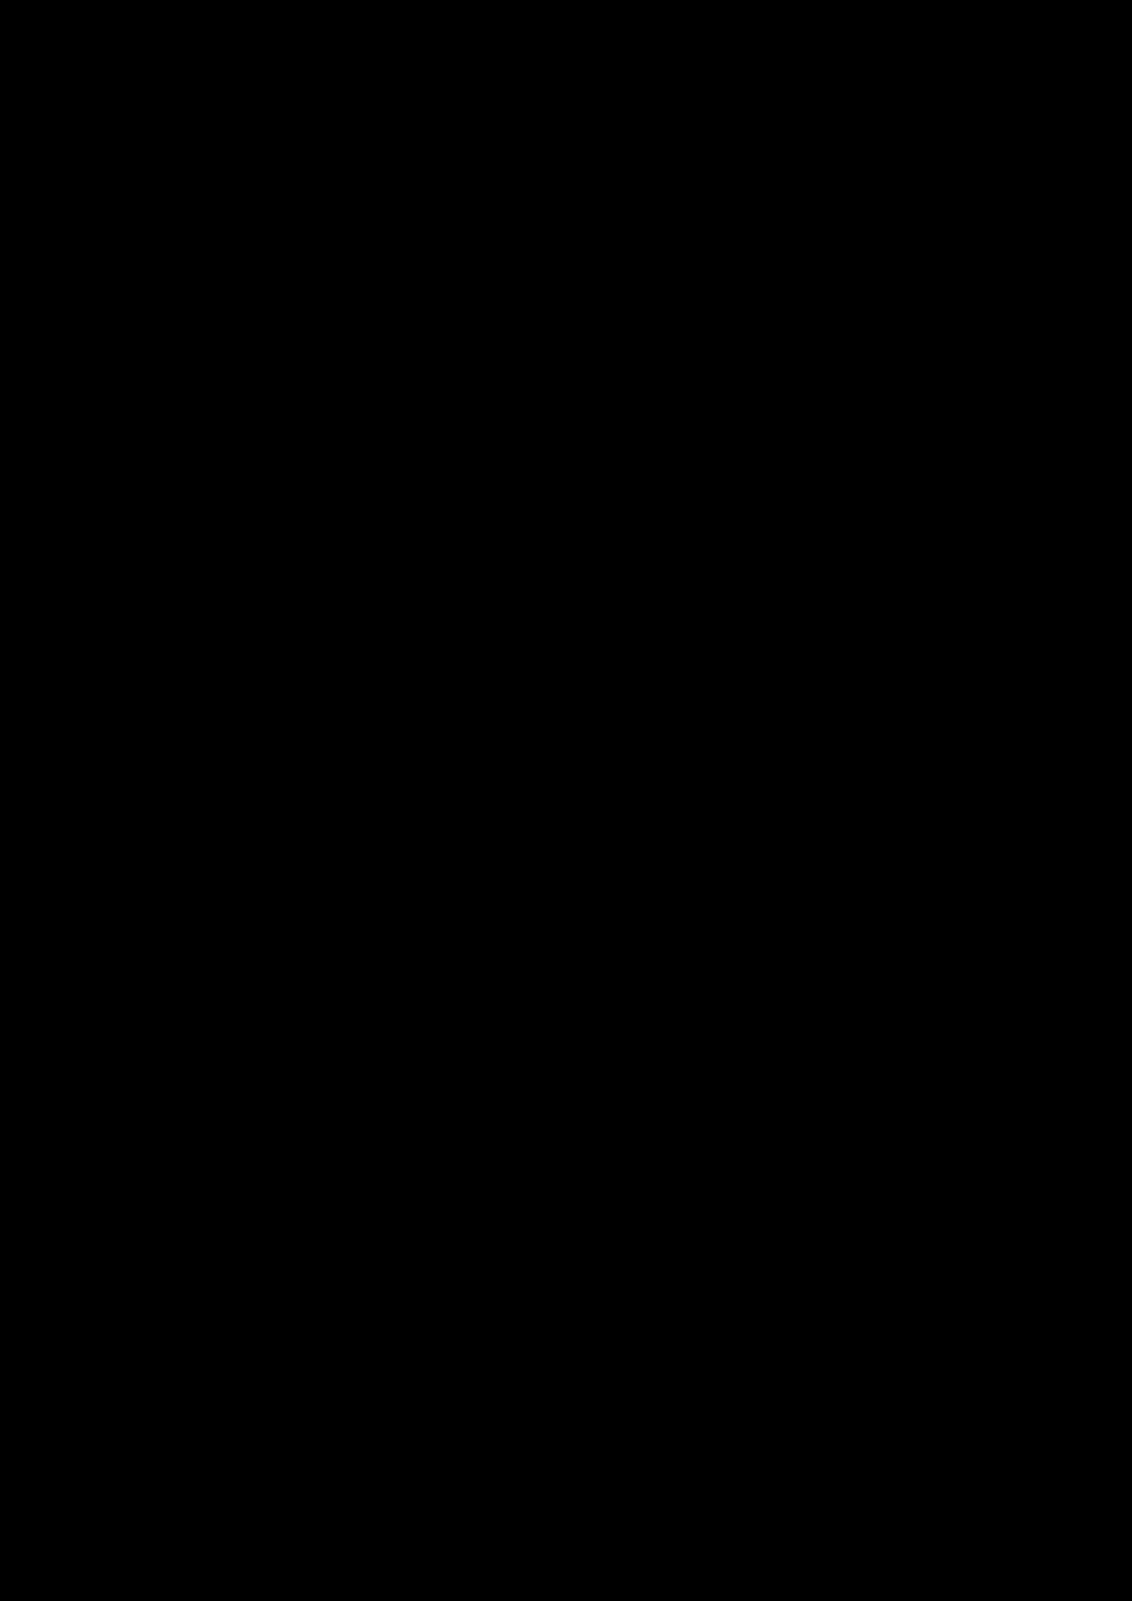 Belyiy sokol slide, Image 141